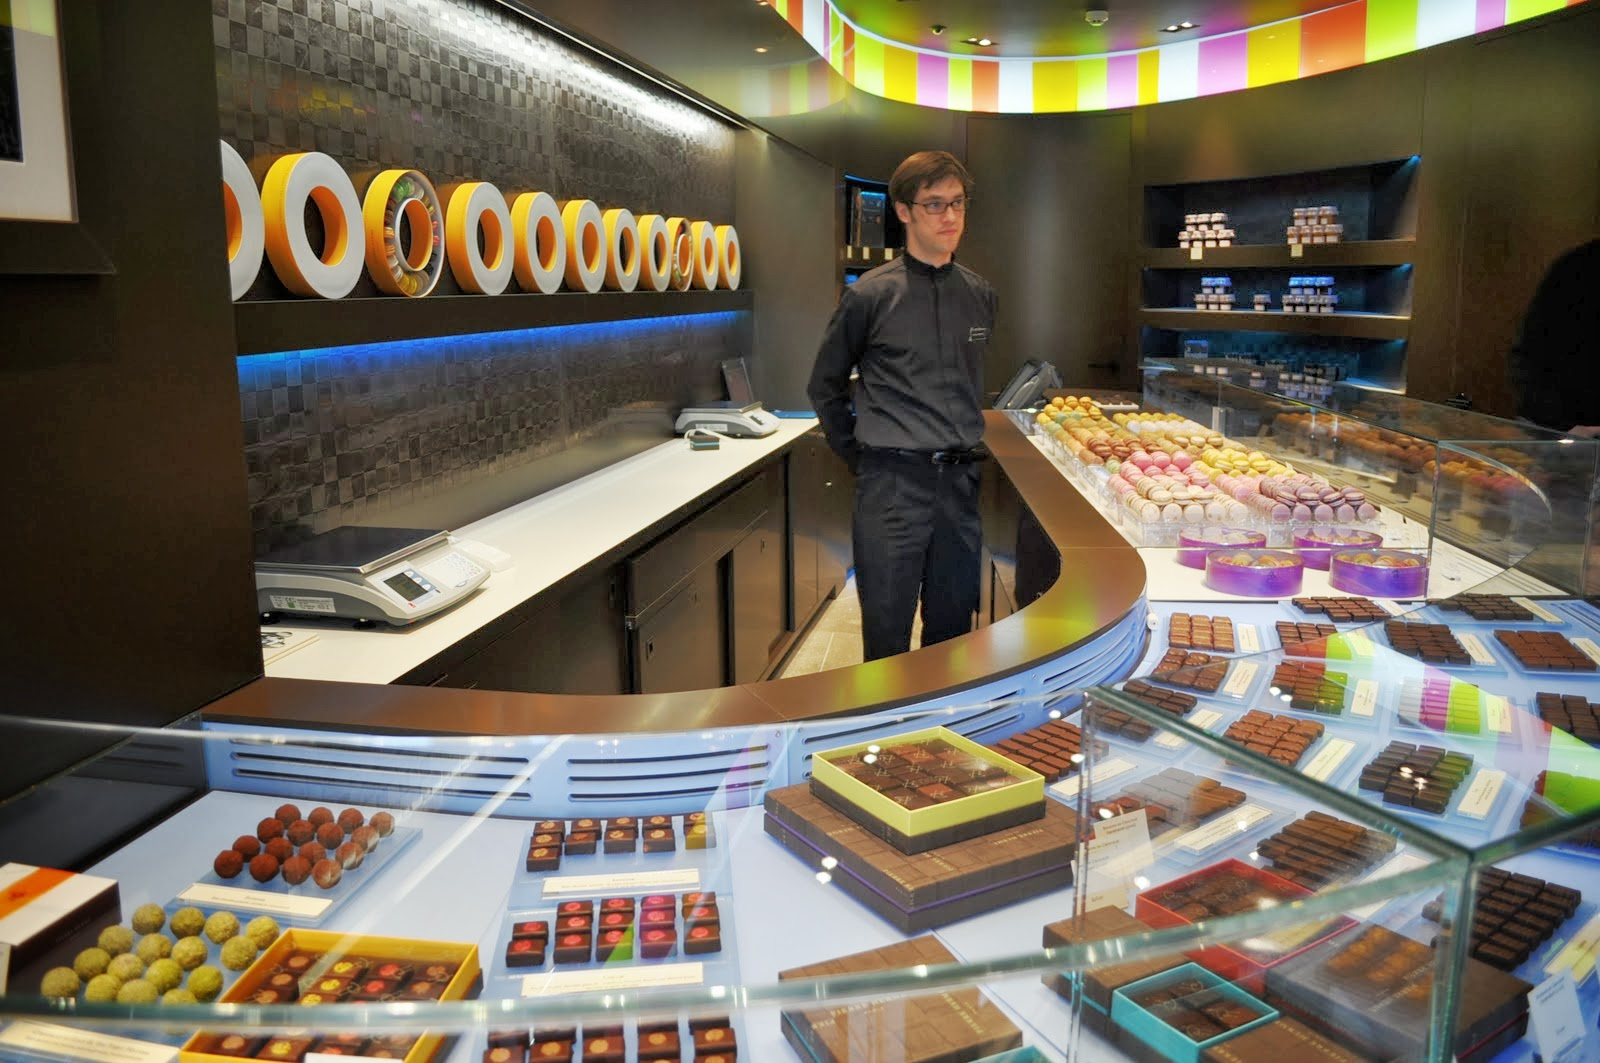 Pierre Herme macarons London store Belgravia review JPG